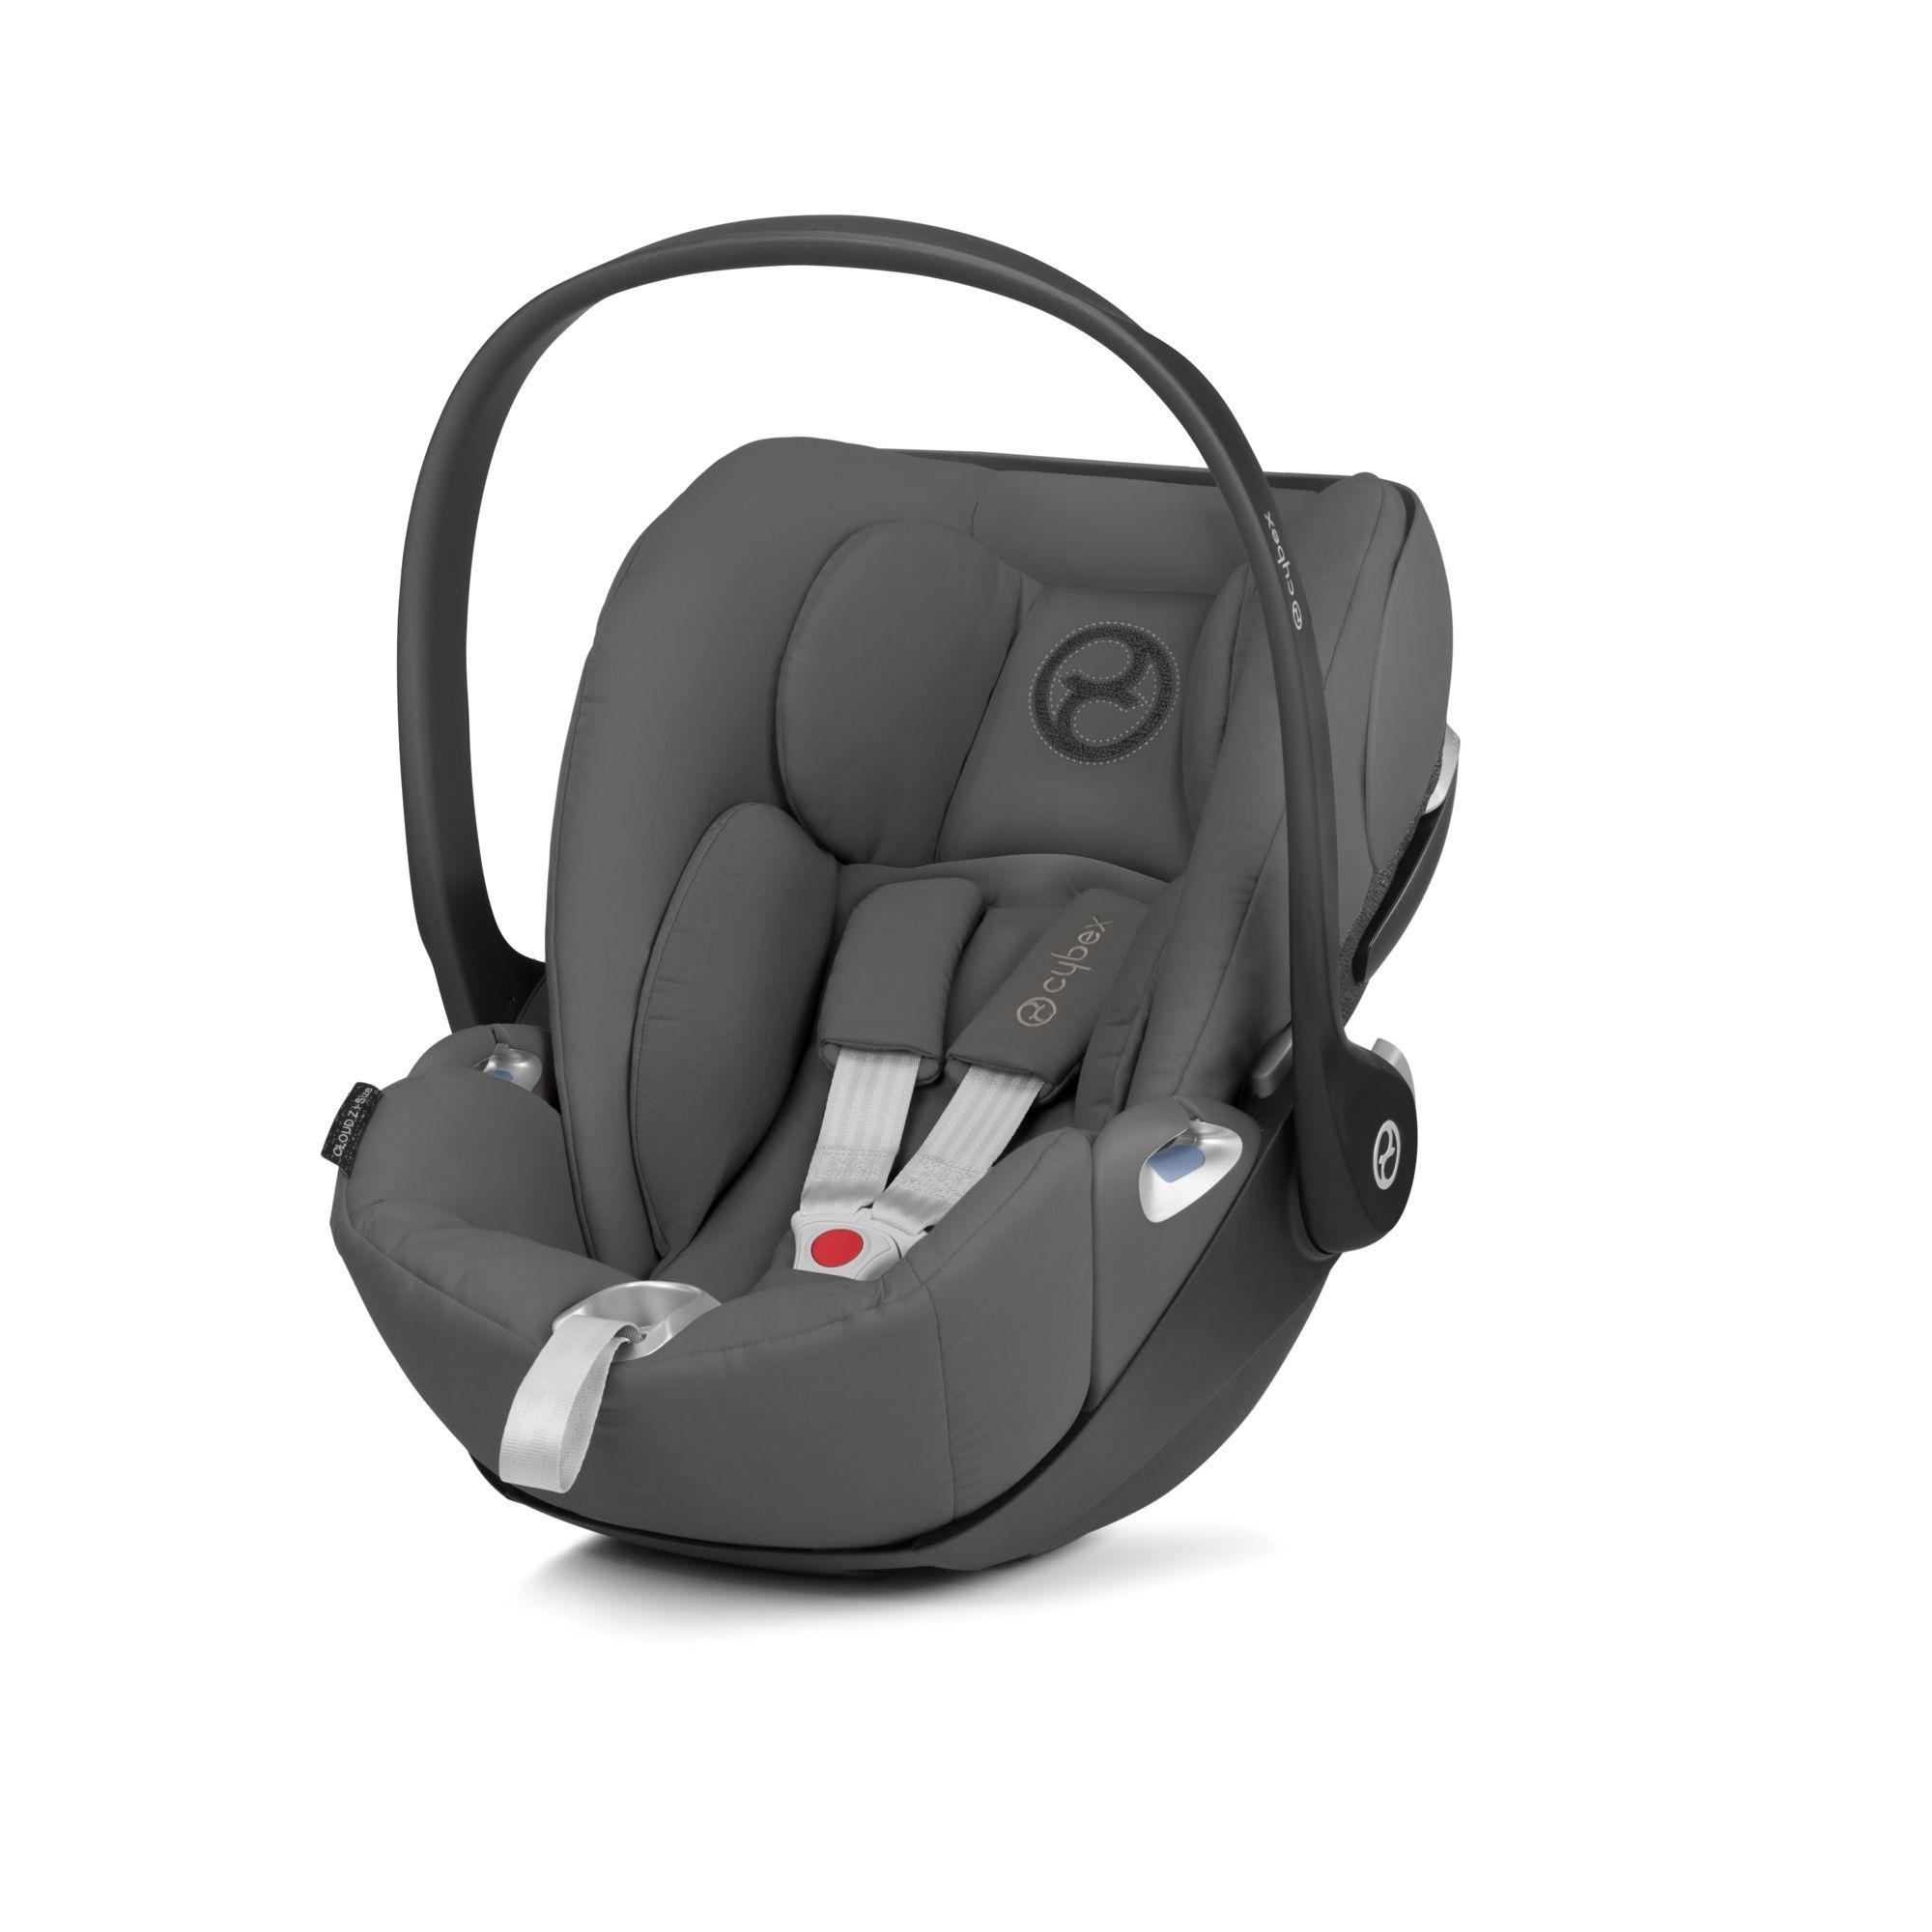 [babybrands] Cybex Cloud Z i-Size Babyschale Autositz